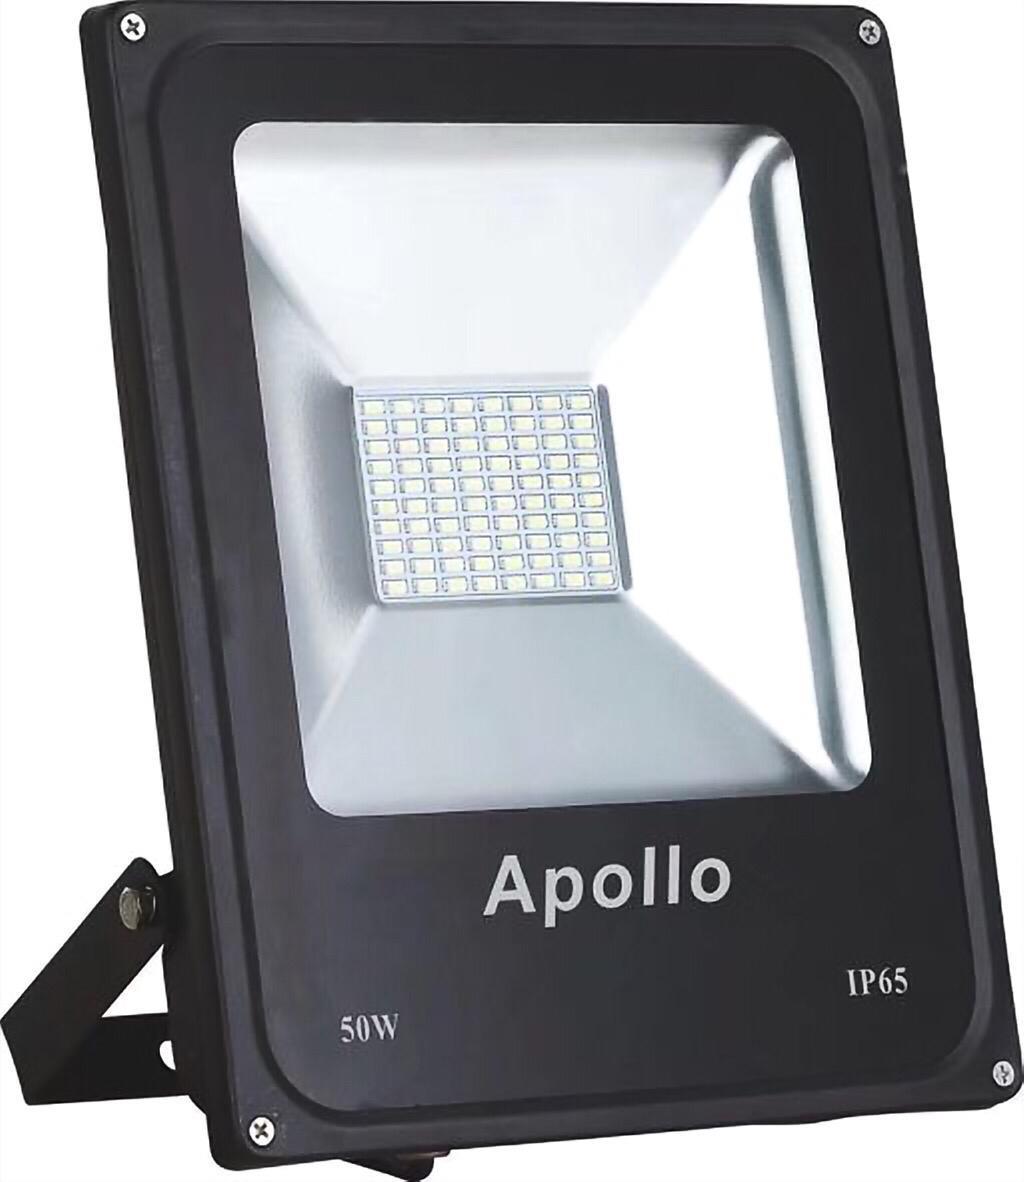 Jual Lampu Sorot LED / Flood Light Apollo -50 Watt Harga